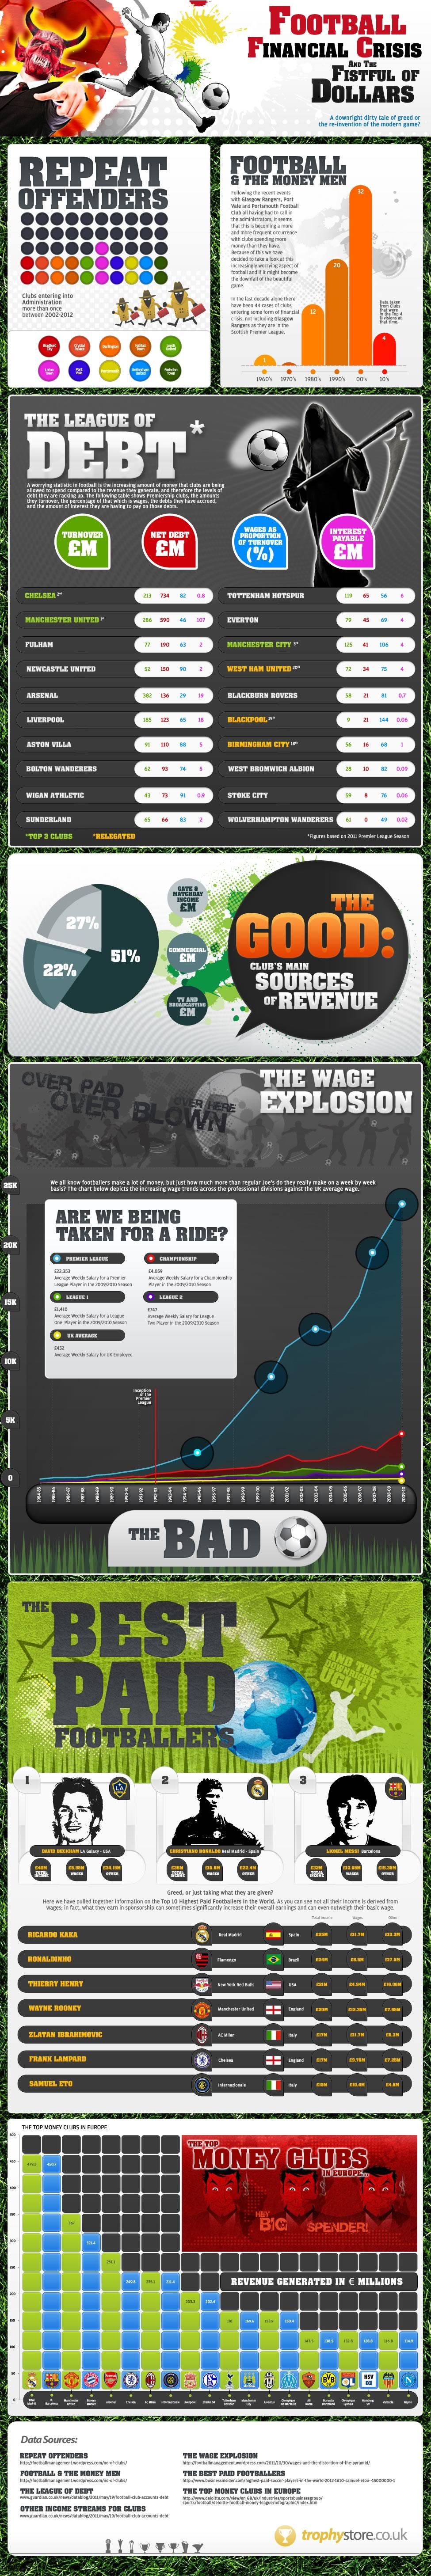 Football Financial Crisis Infographic